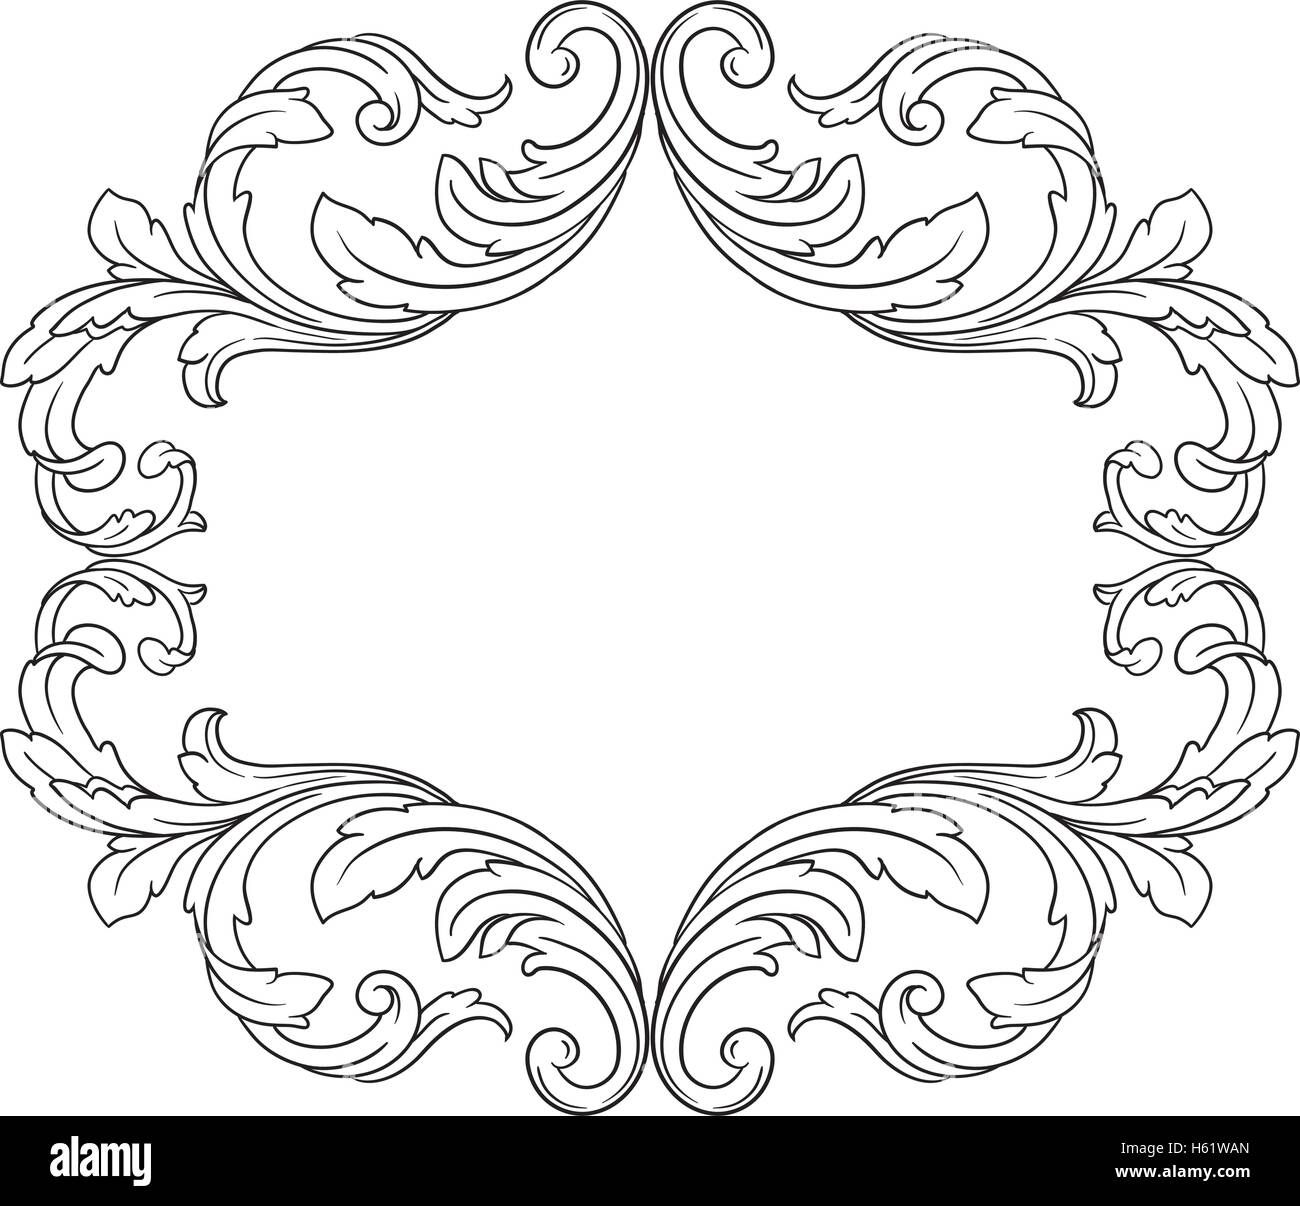 Vintage Barock-Rahmen Scroll Ornament Gravur Grenze Blumenmuster ...